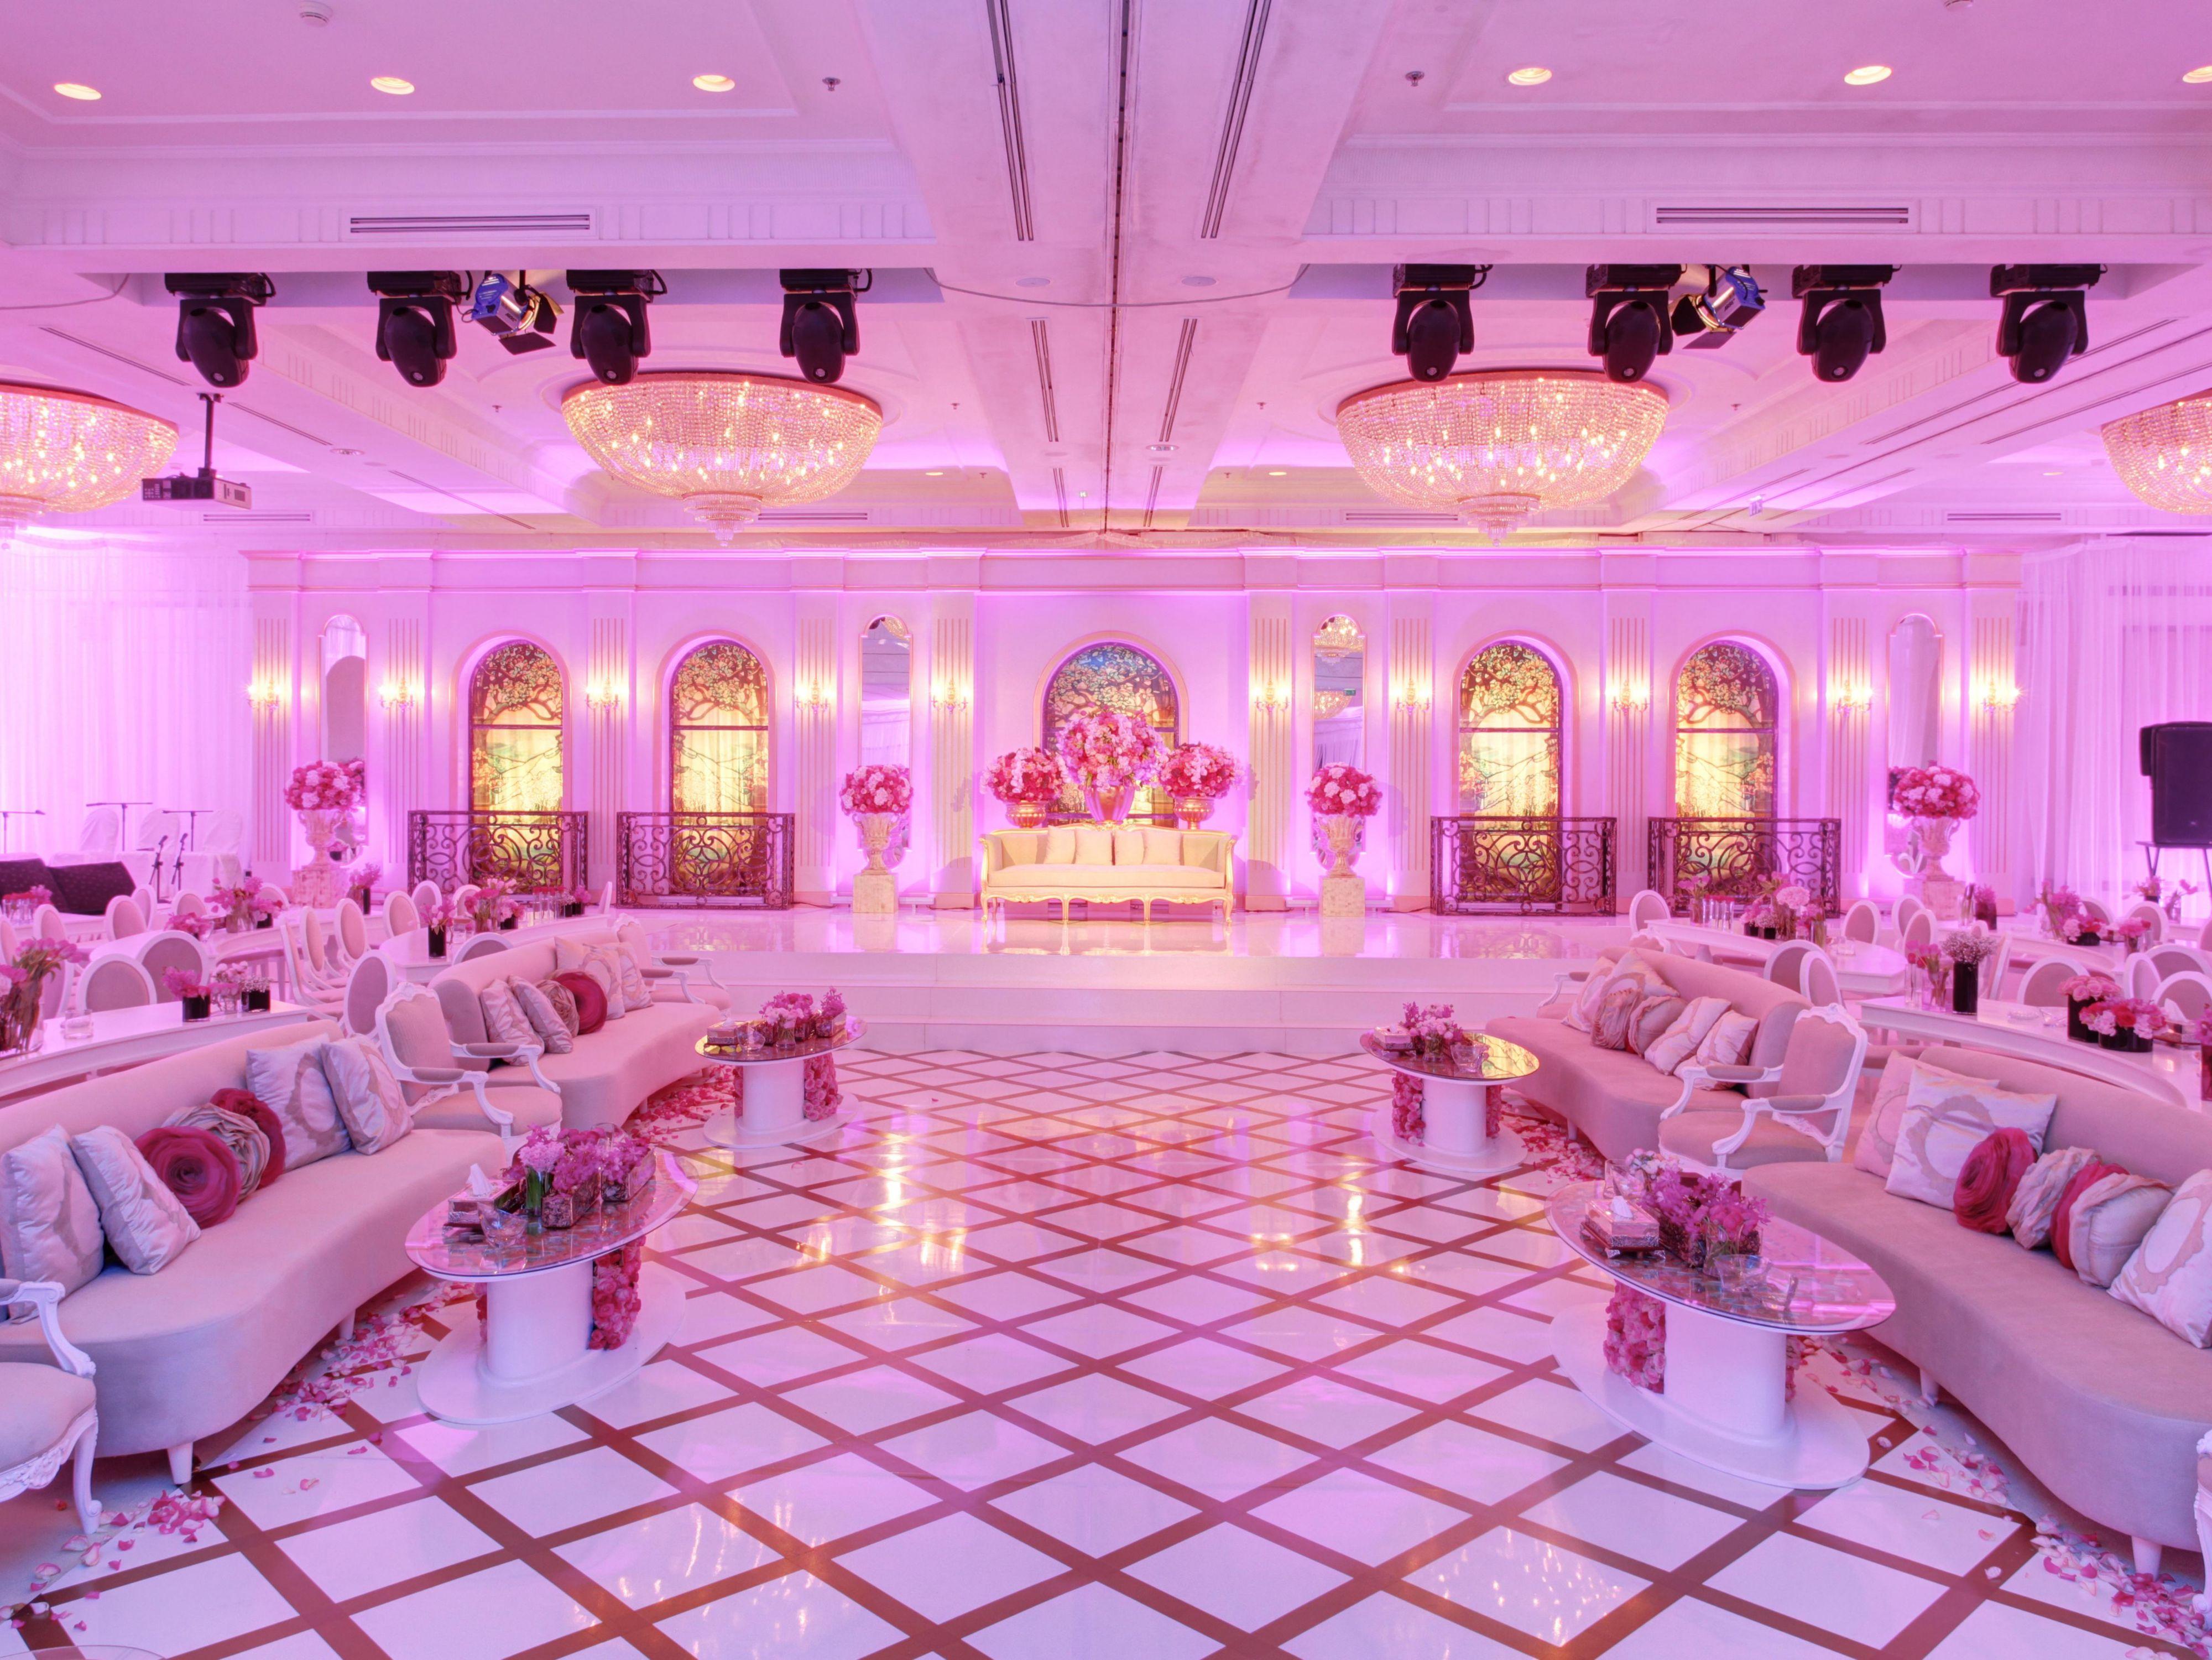 Crowne plaza jeddah hotel meeting rooms for rent ballroom photo junglespirit Choice Image